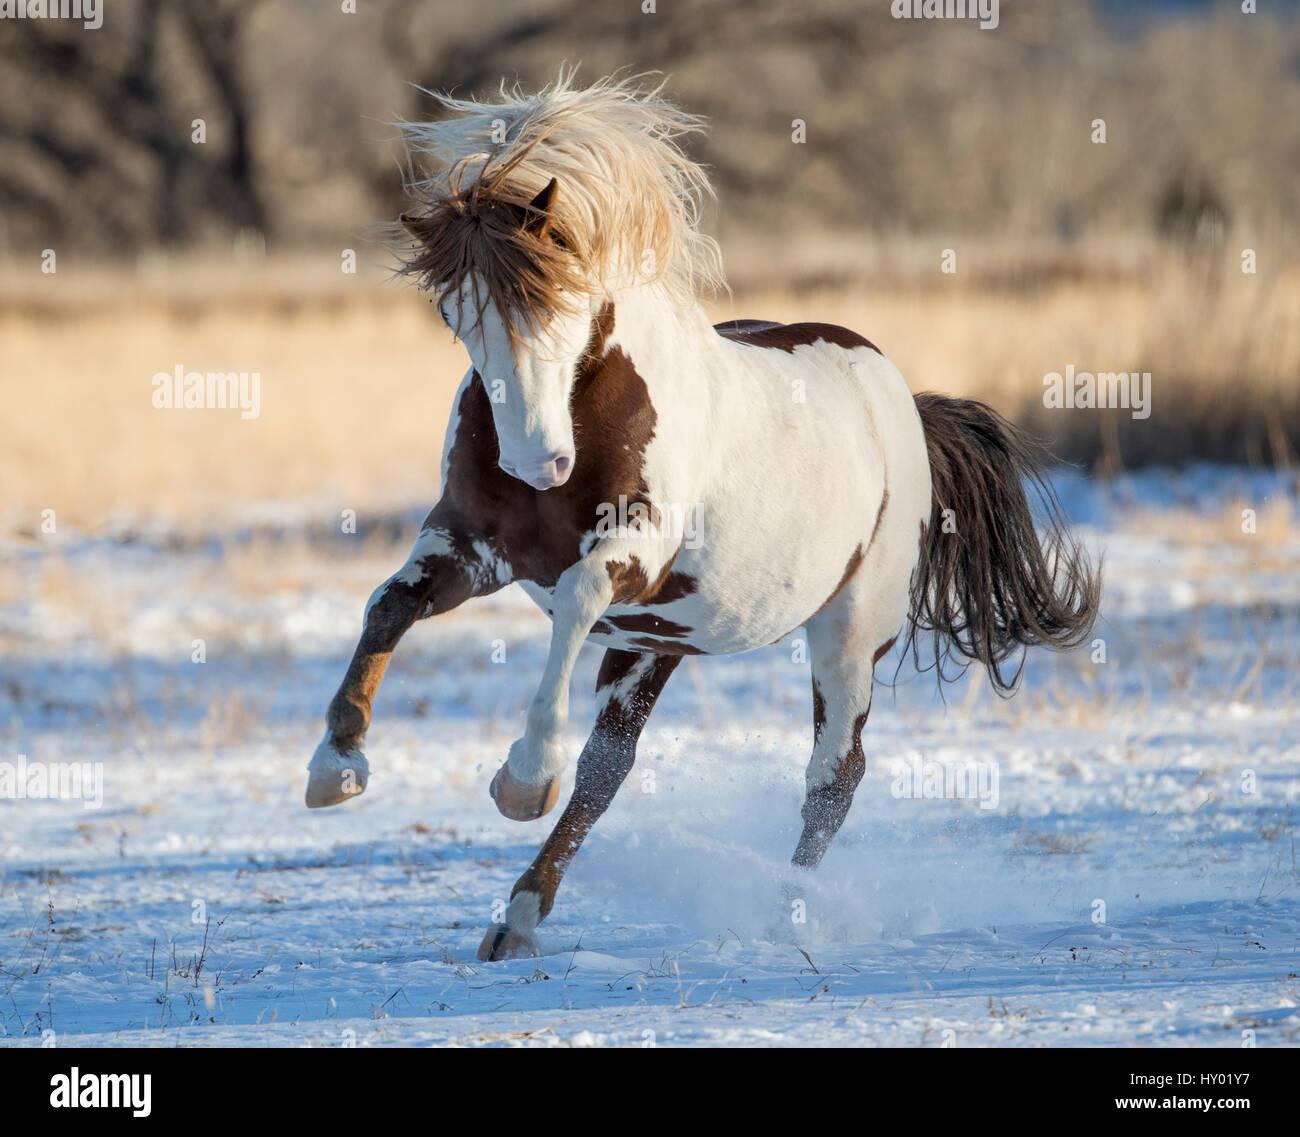 Wild pinto Mustang stallion running in snow, Black Hills Wild Horse Sanctuary, South Dakota, USA. January. - Stock Image